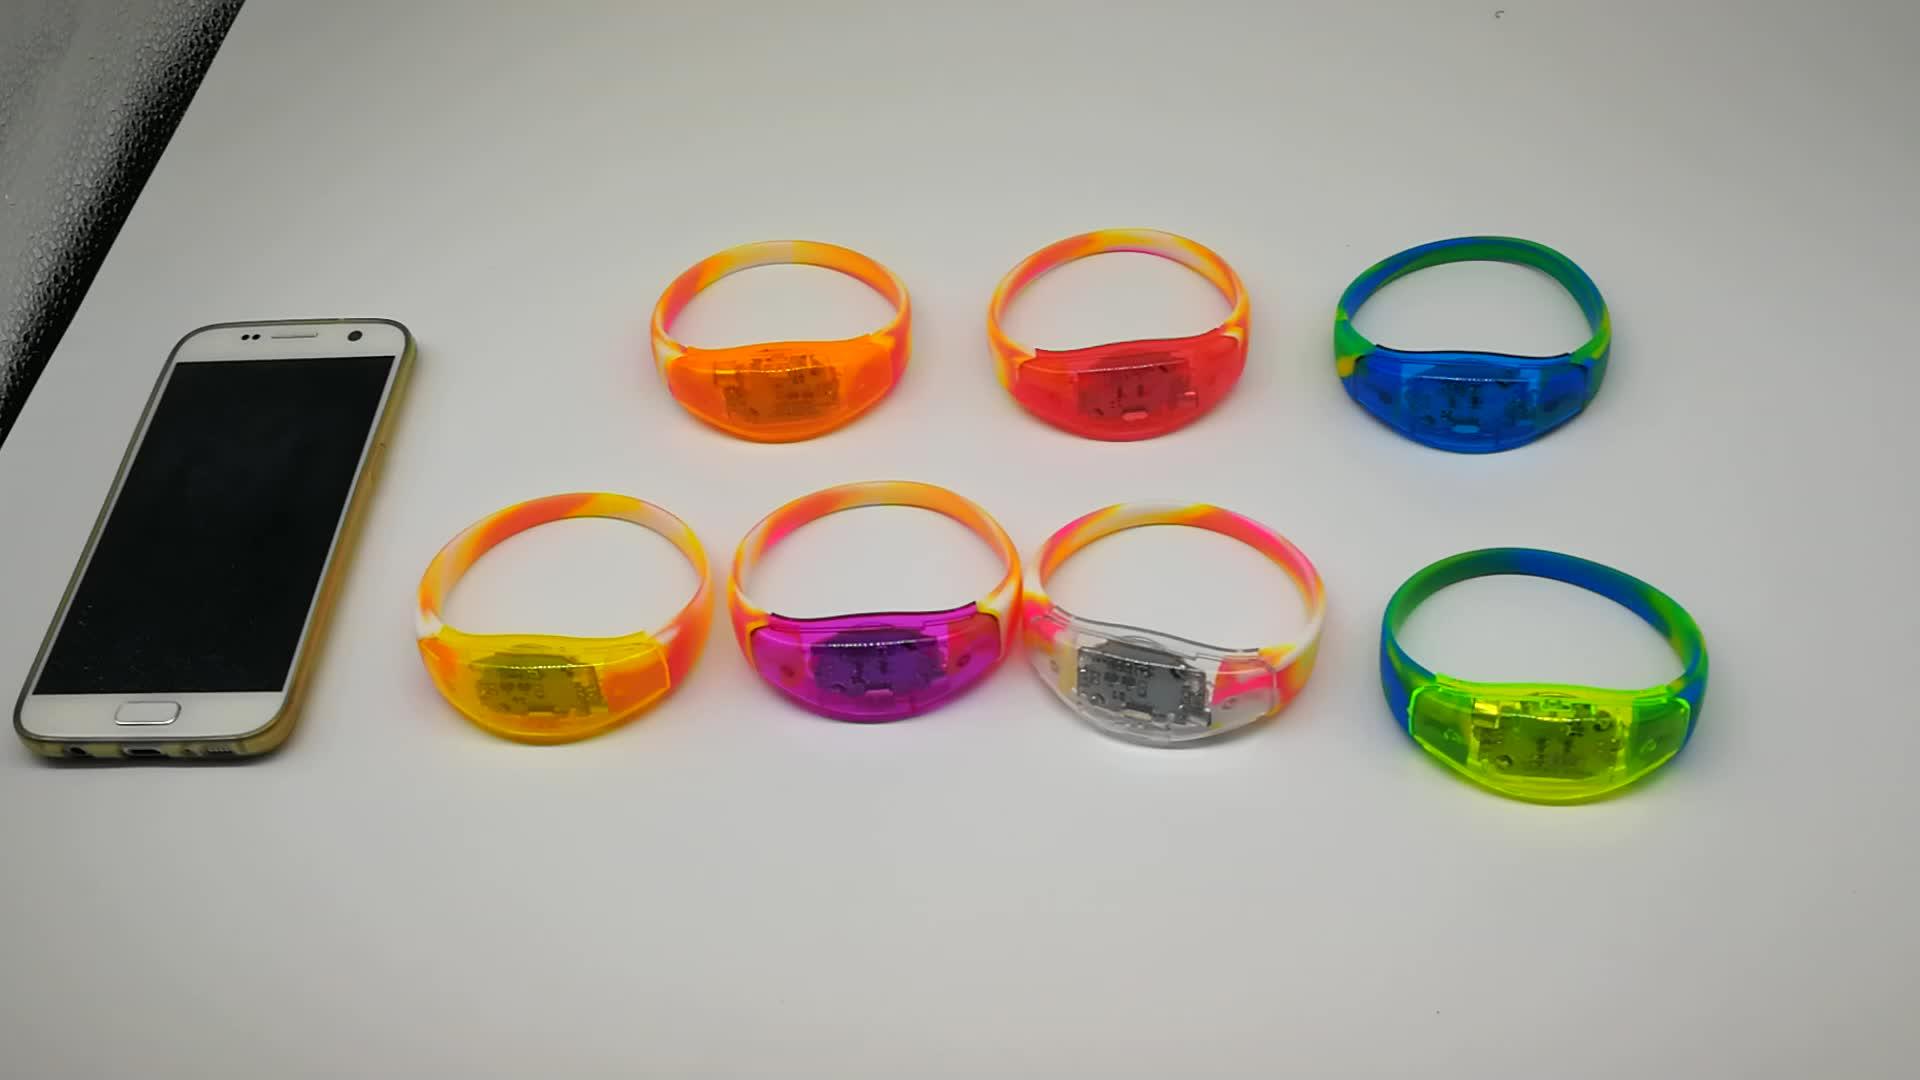 Party/Vocal concert/Bar energie Sound aktiviert LED Silikon armband